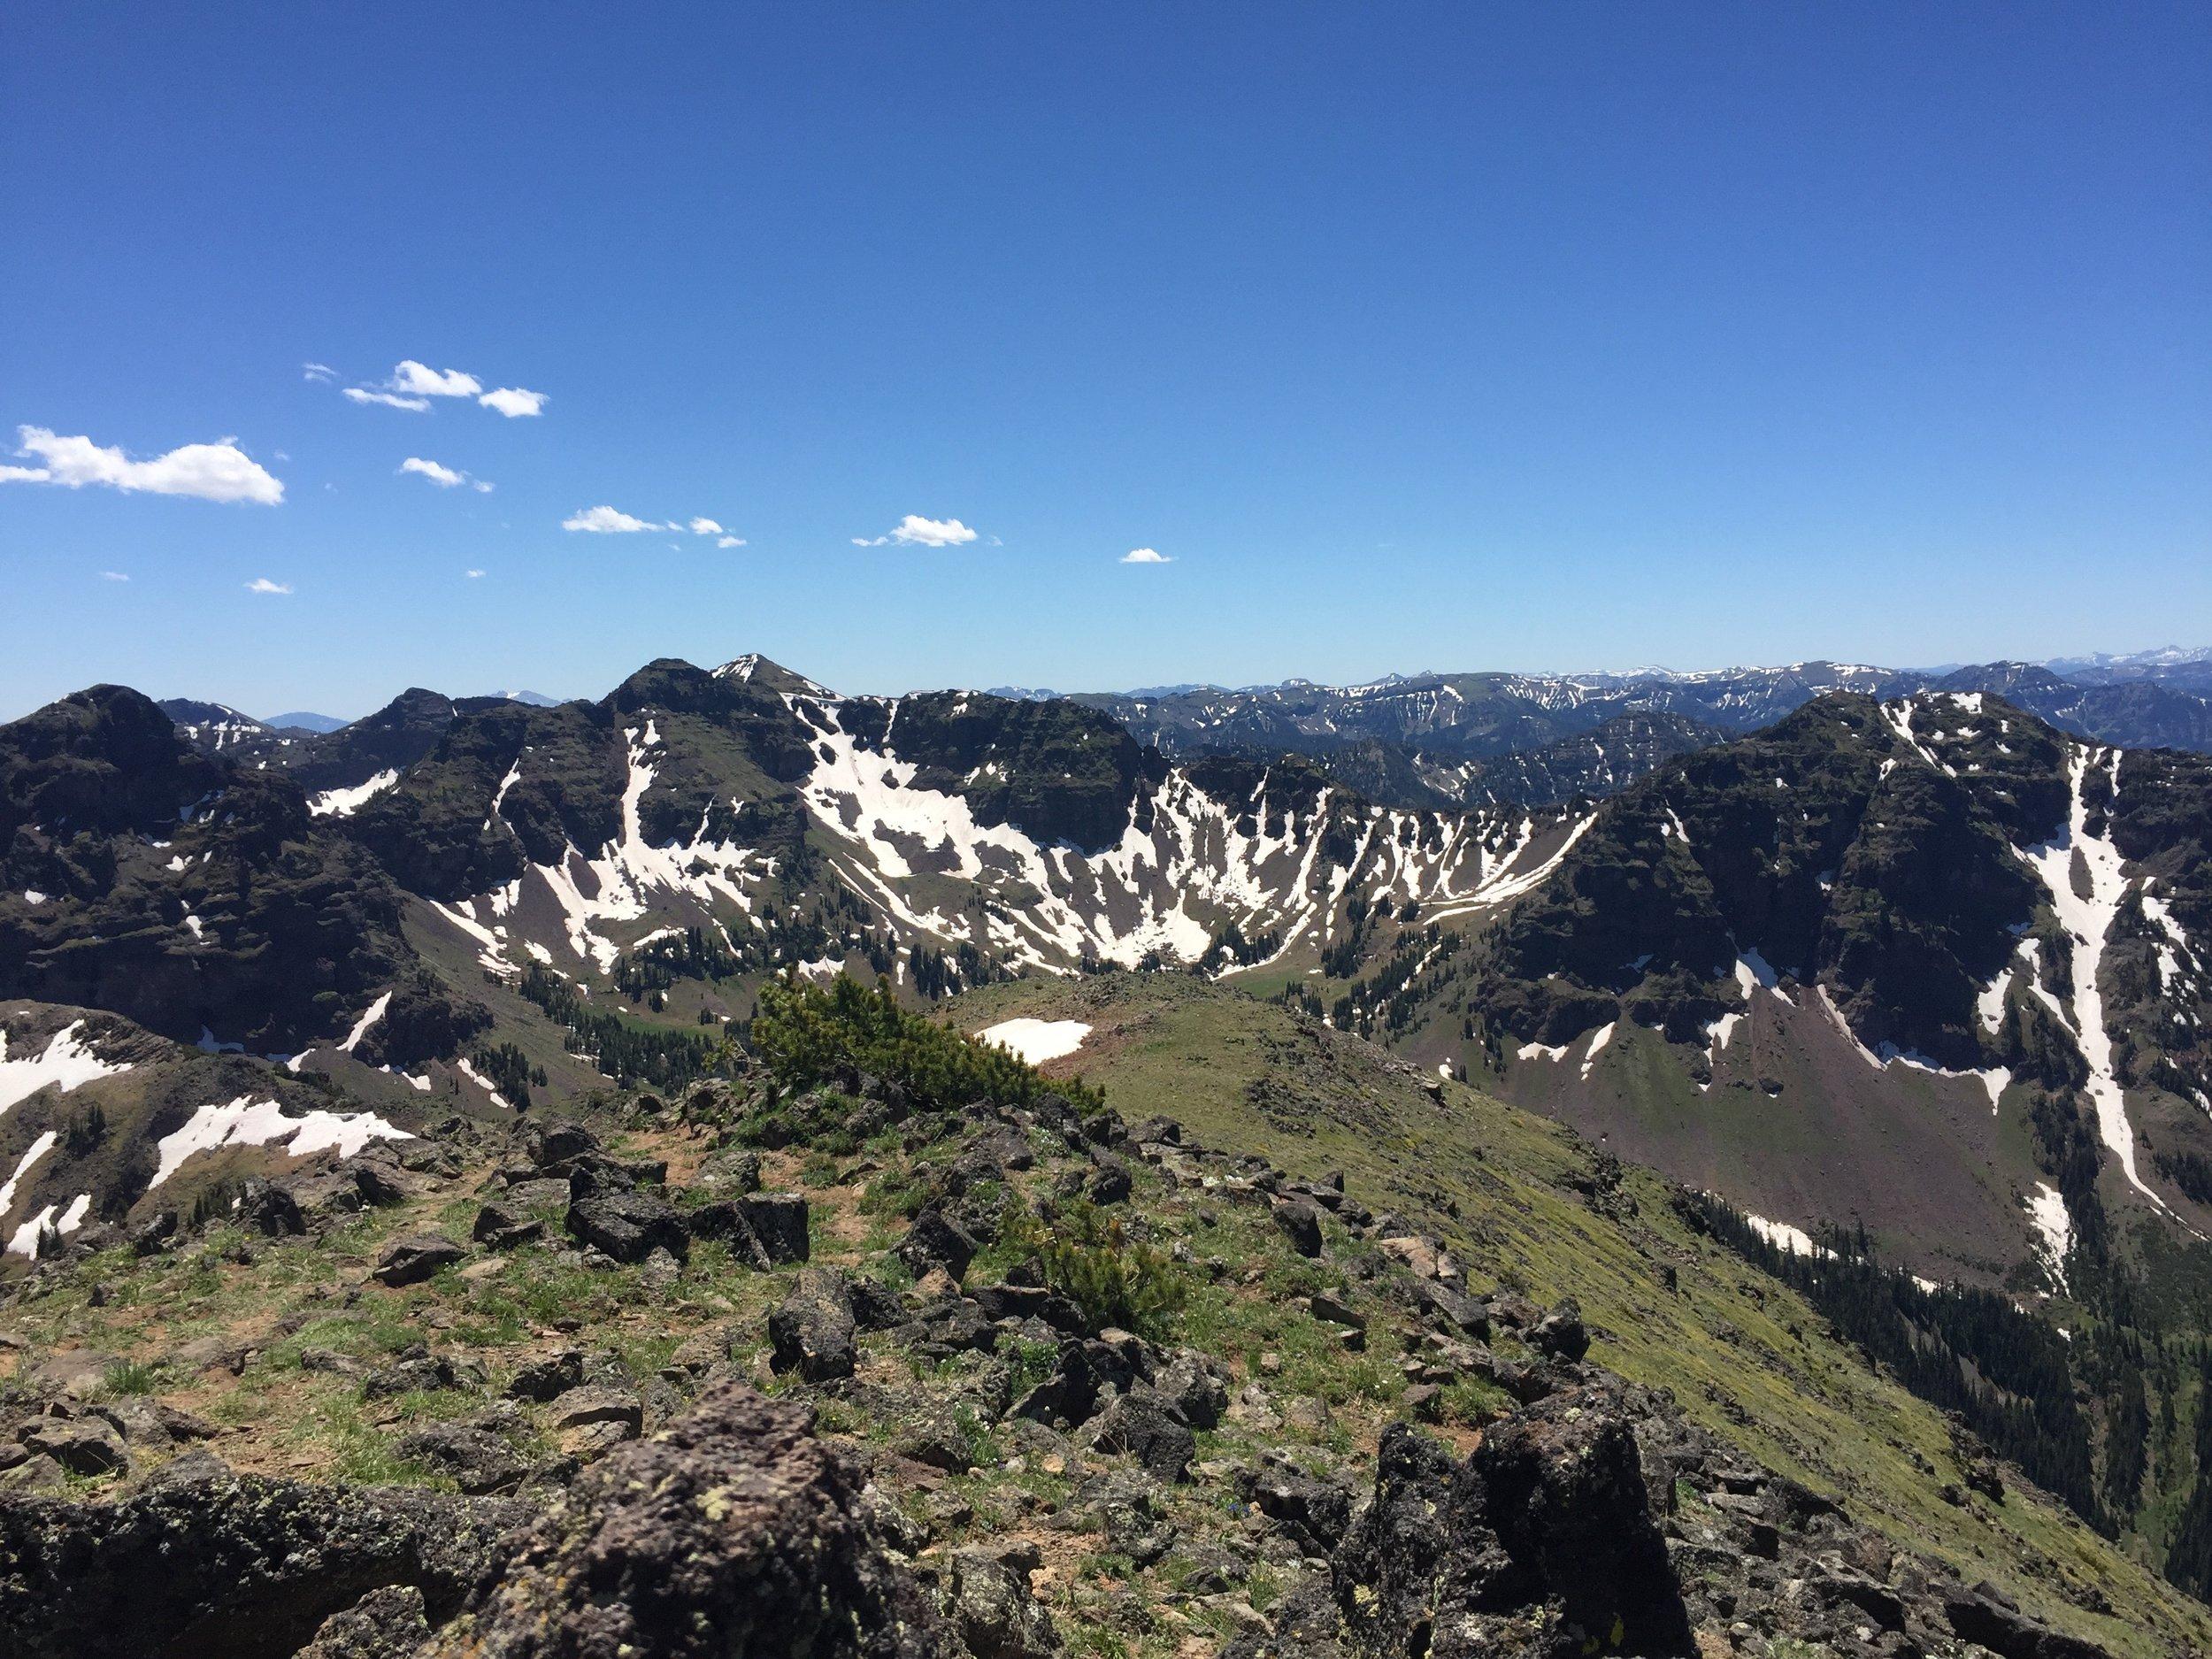 USGS INTERNSHIP- BOZEMAN, MT (2016)